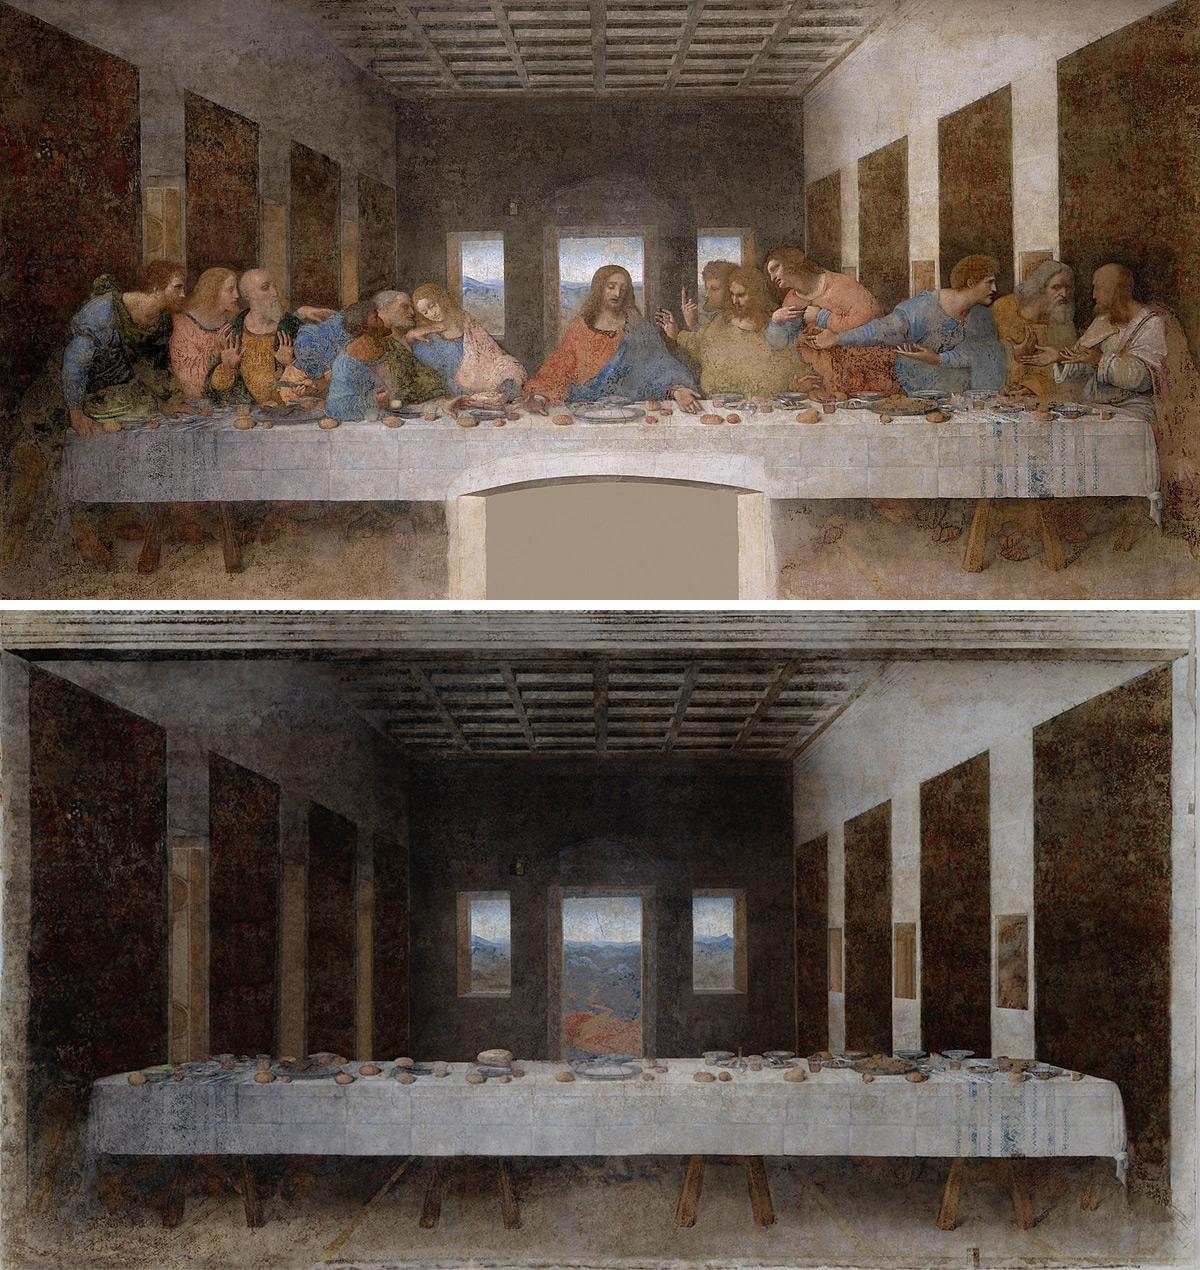 «Тайная вечеря», Леонардо да Винчи, 1498 г.